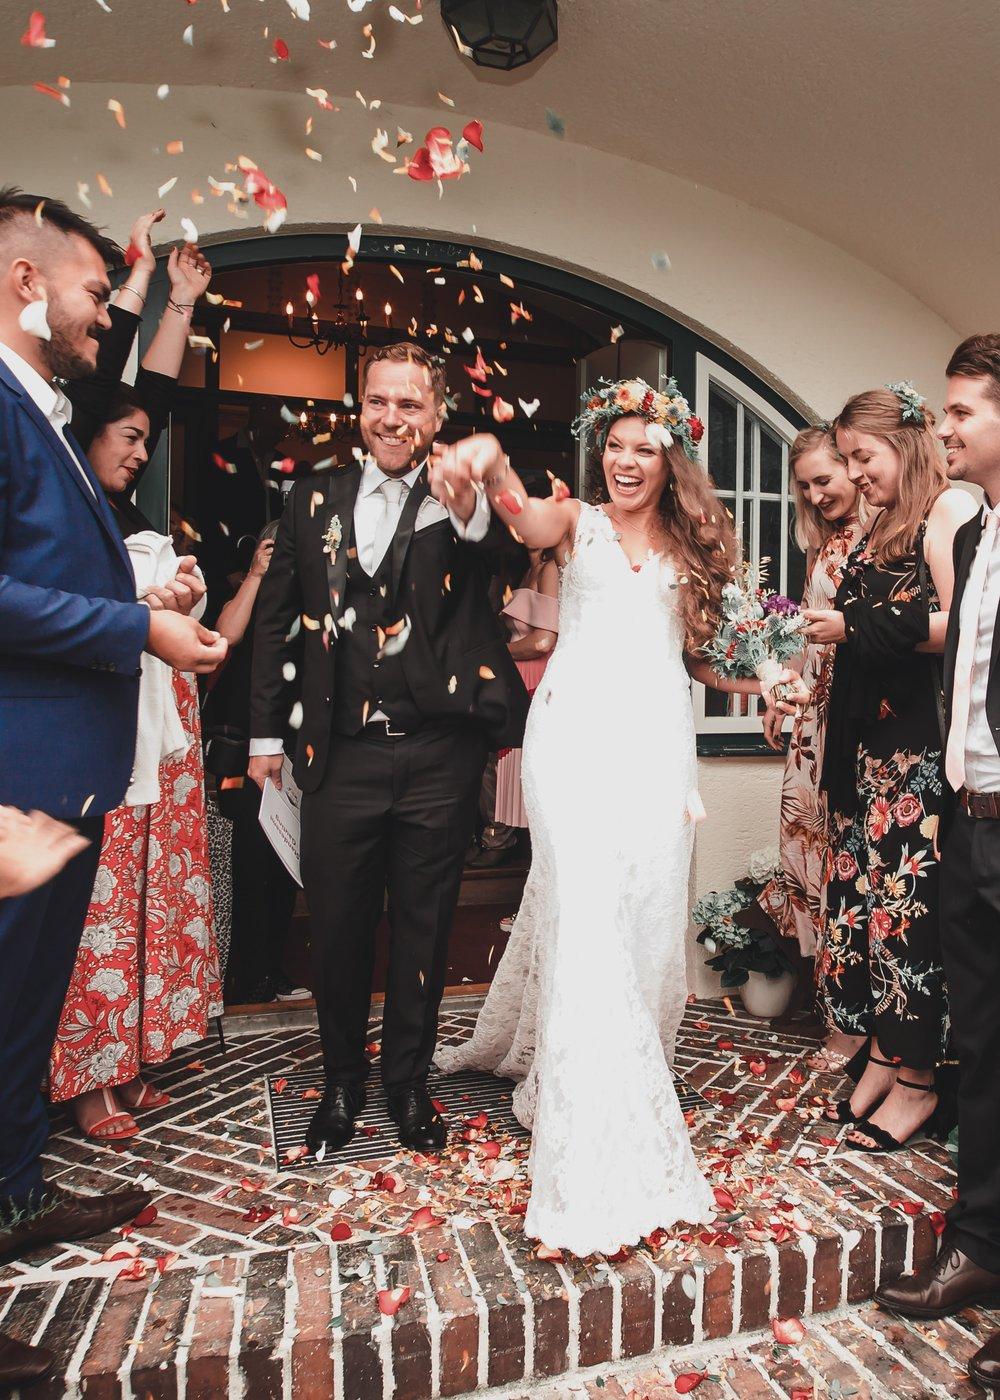 bride-bride-and-groom-celebration-1770964.jpg